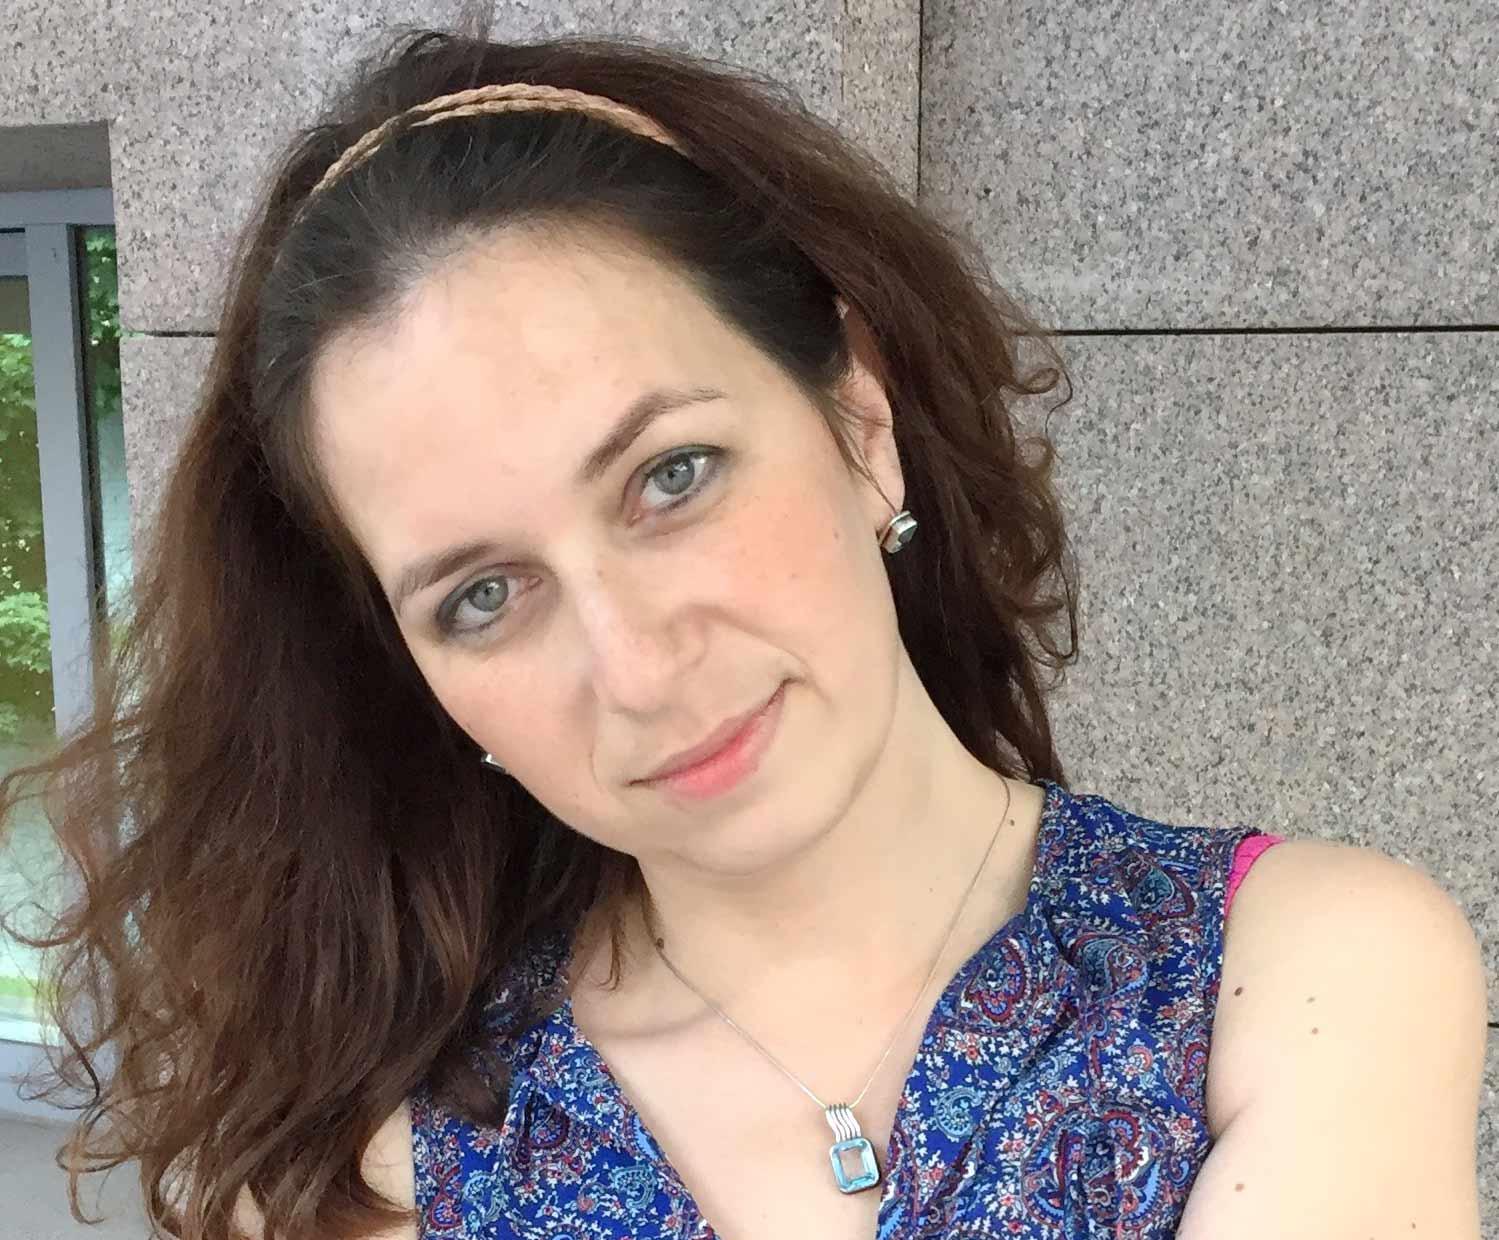 Александра Карагаева, Директор по маркетингу Рекламной студии X-Project